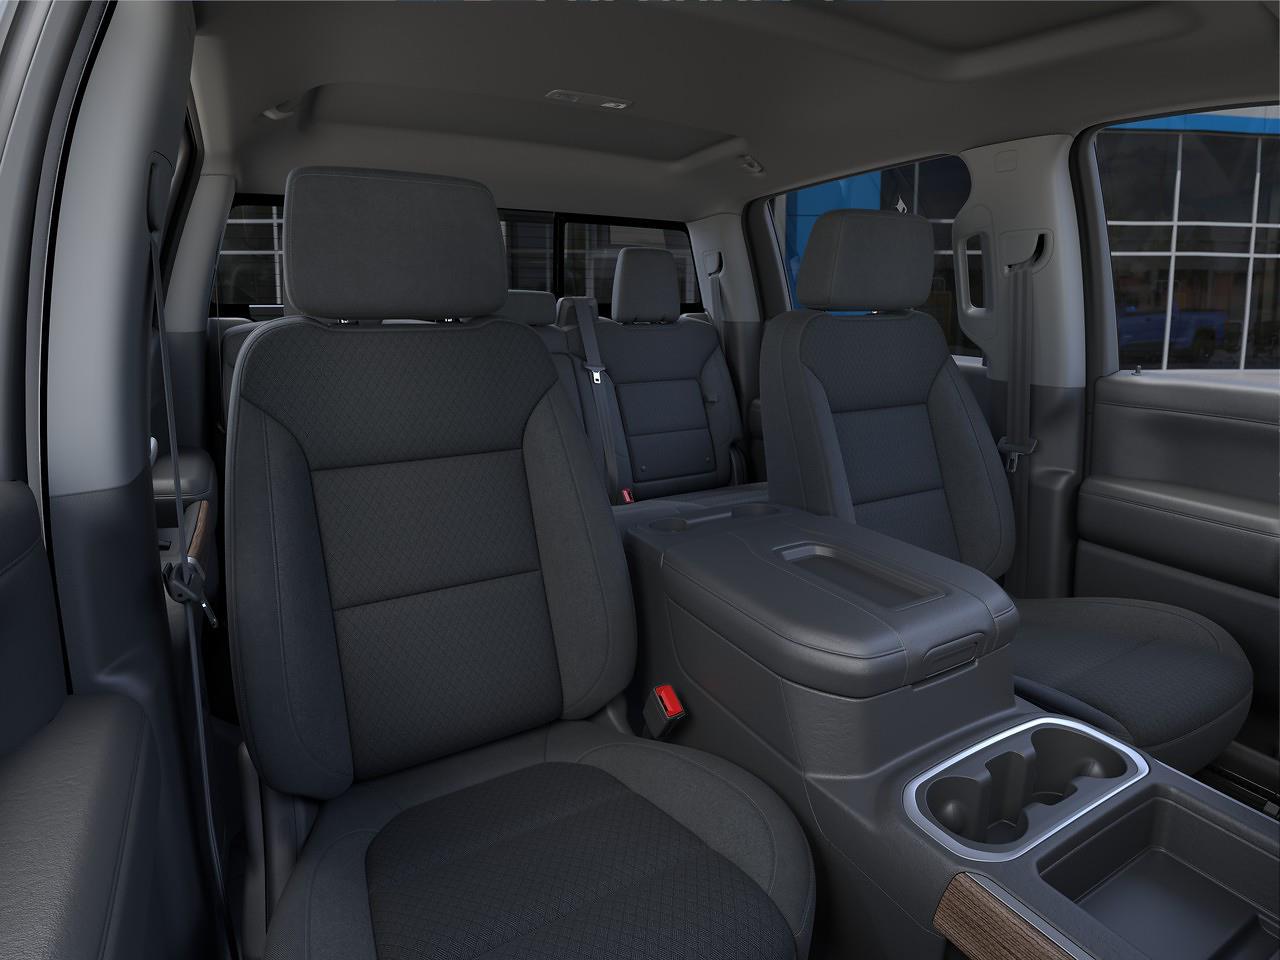 2021 Chevrolet Silverado 1500 Crew Cab 4x4, Pickup #Q210132 - photo 46